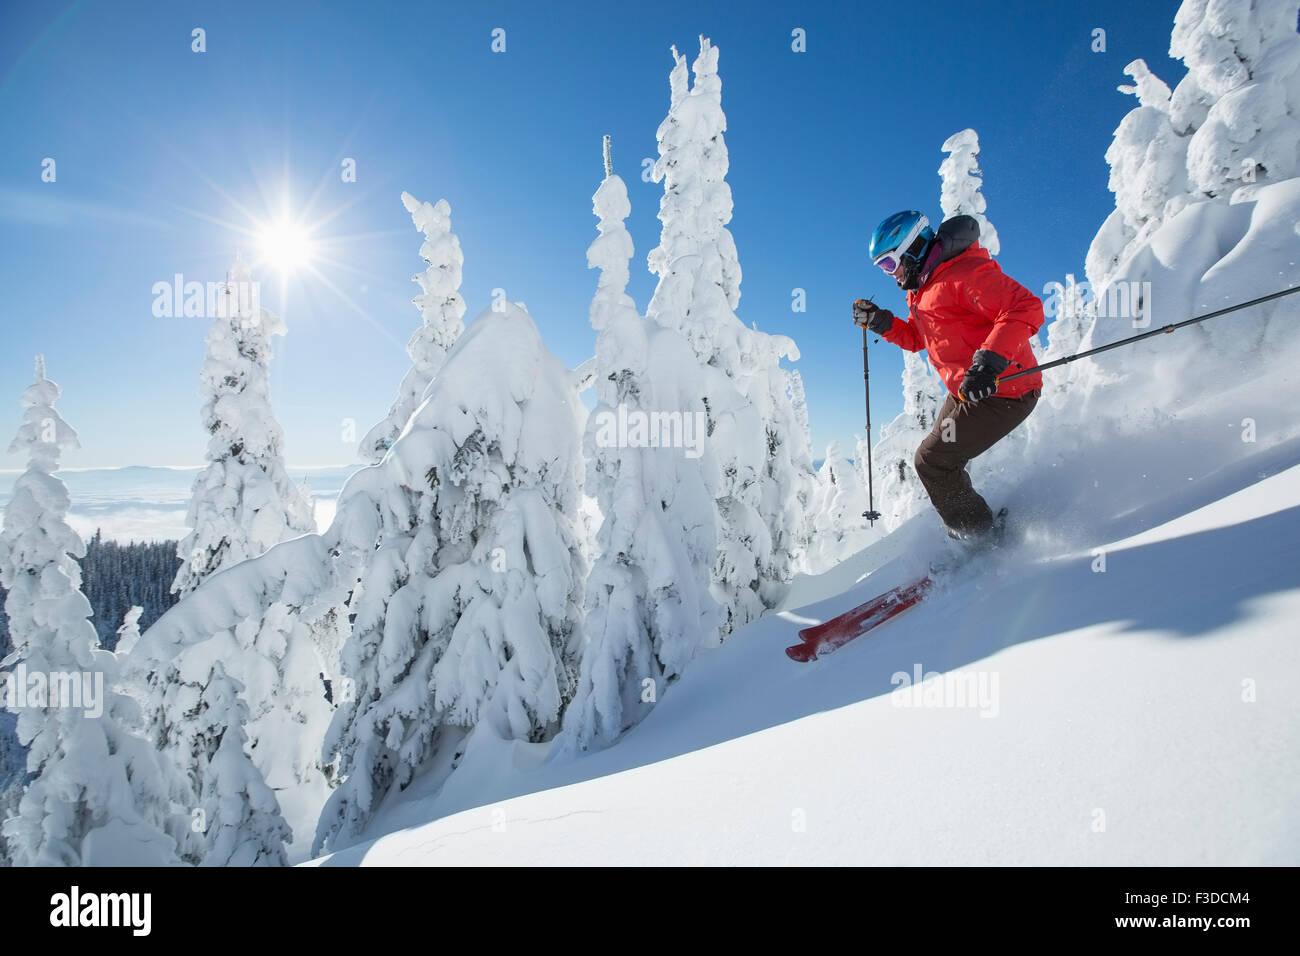 Mature woman on ski slope at sunlight - Stock Image